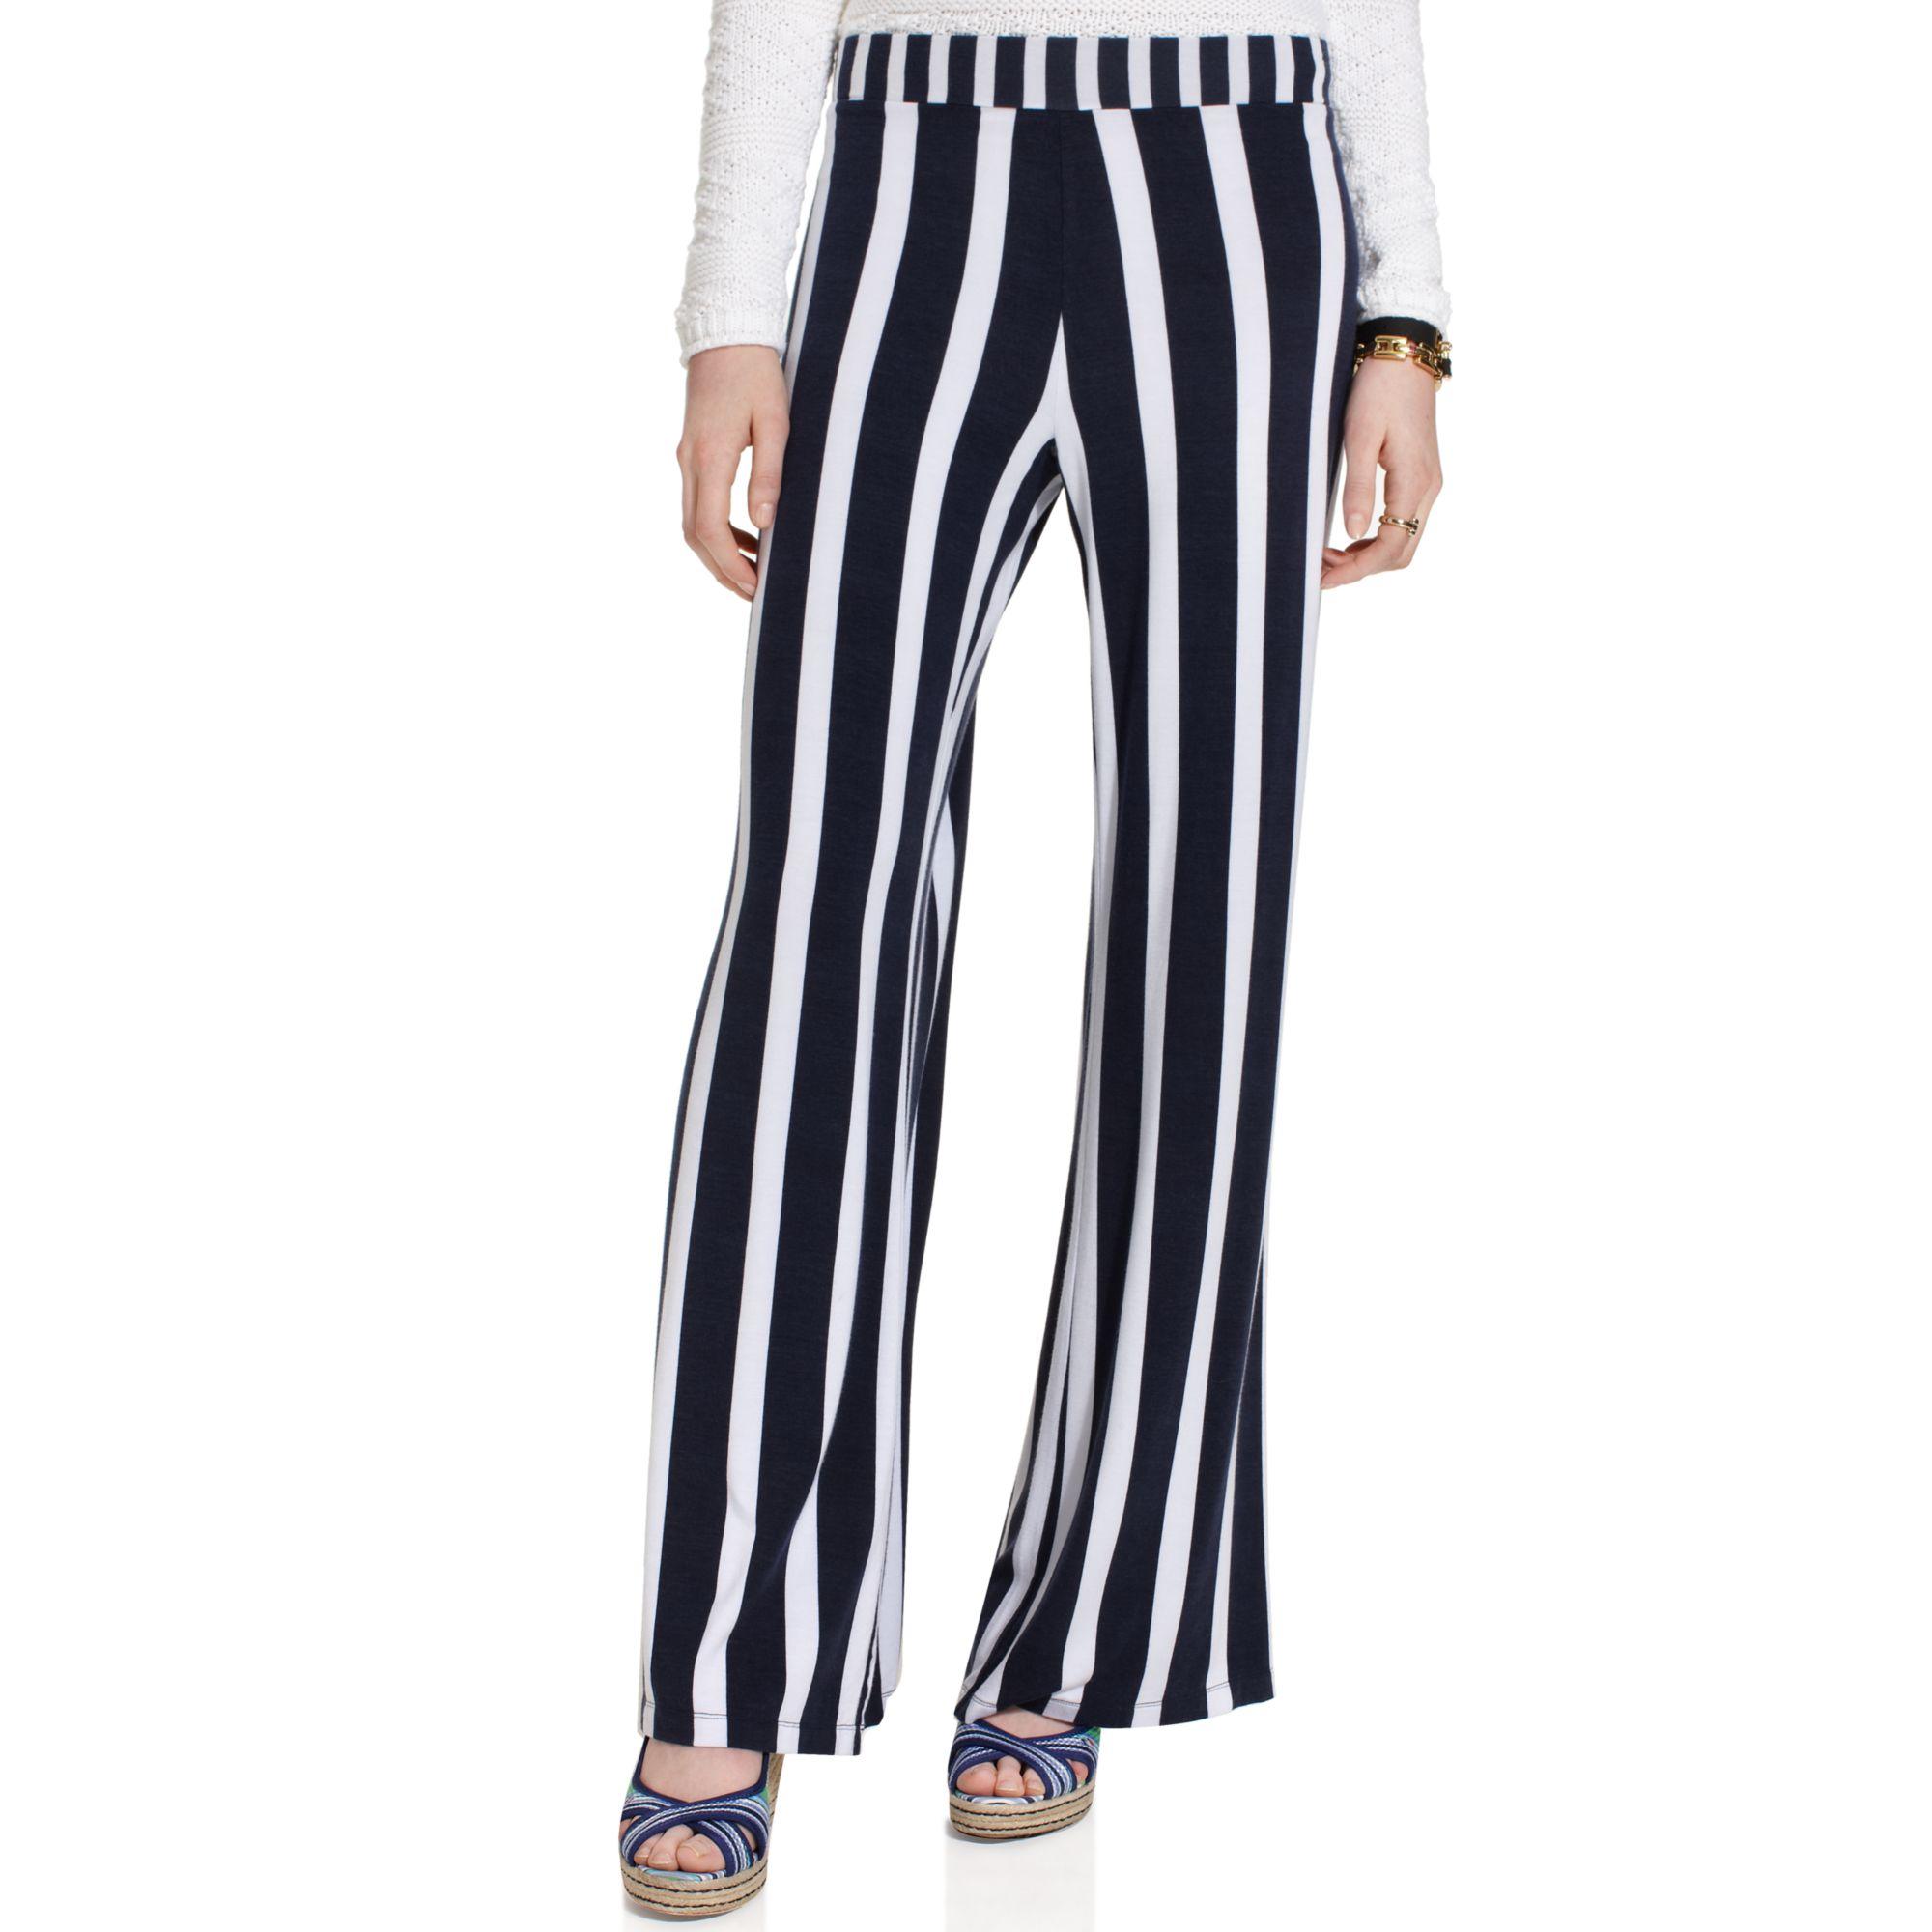 tommy hilfiger striped wideleg pullon pants in blue bright white navy stripe lyst. Black Bedroom Furniture Sets. Home Design Ideas